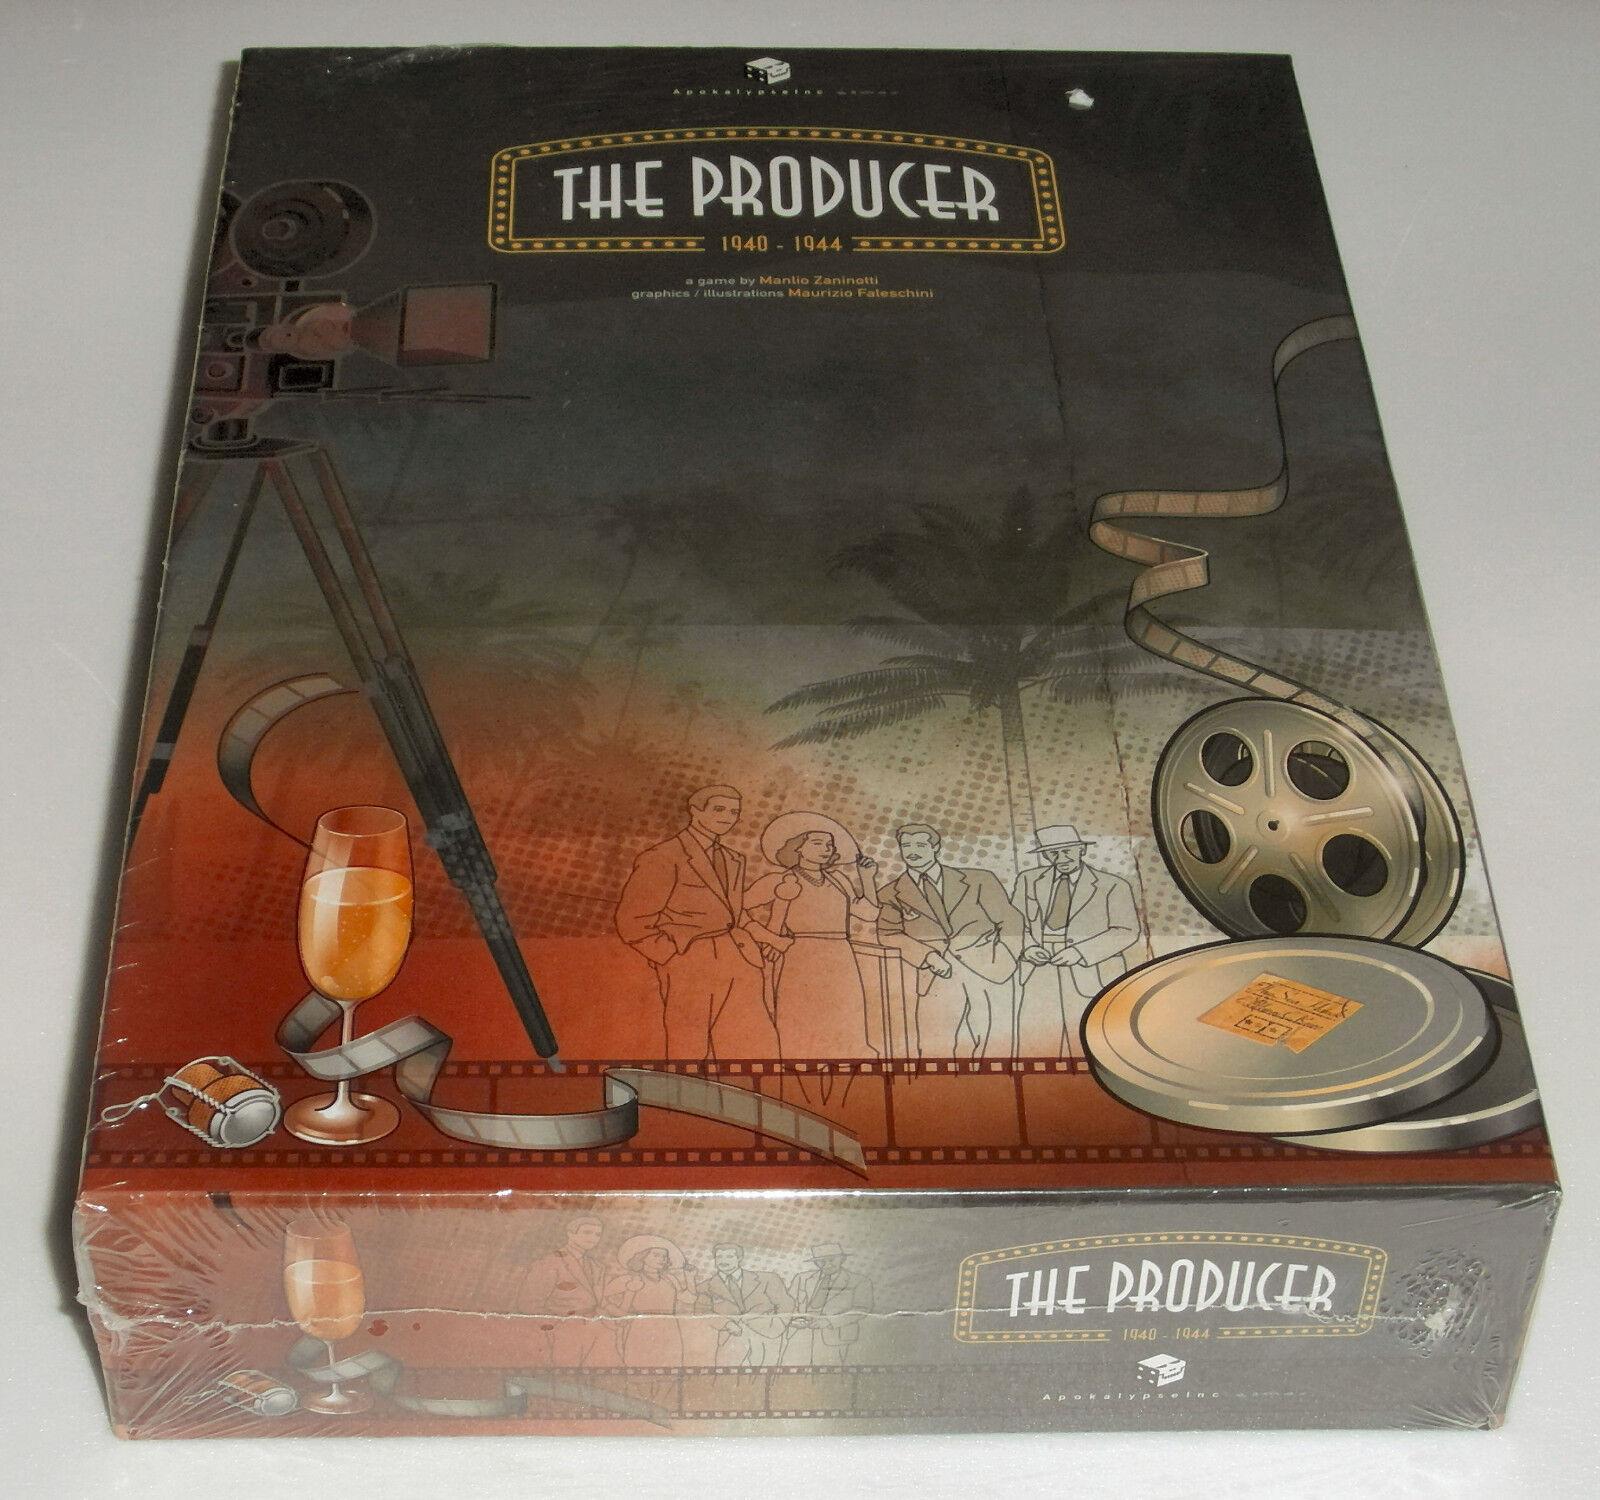 The Producer  1940-1944 - Apokalypse Inc. - 2015